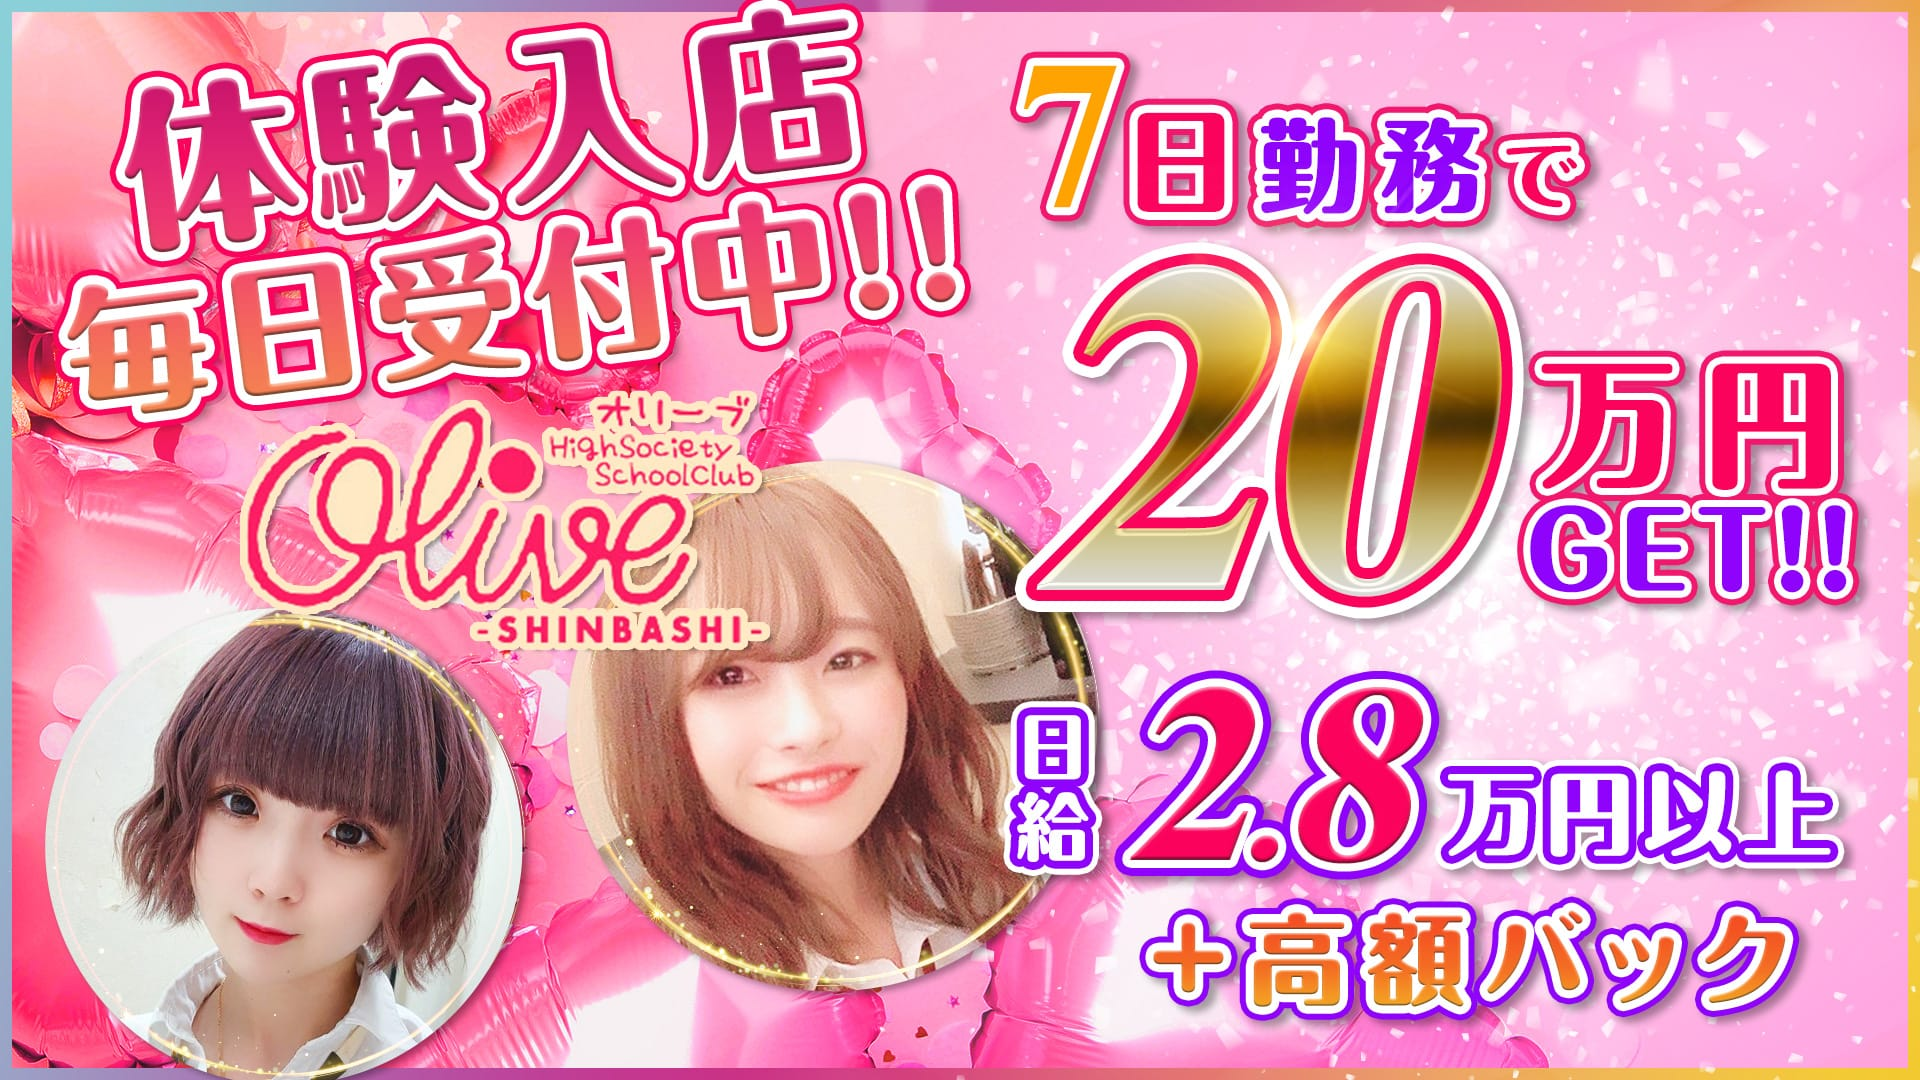 Olive 新橋店(オリーブ) 新橋キャバクラ TOP画像